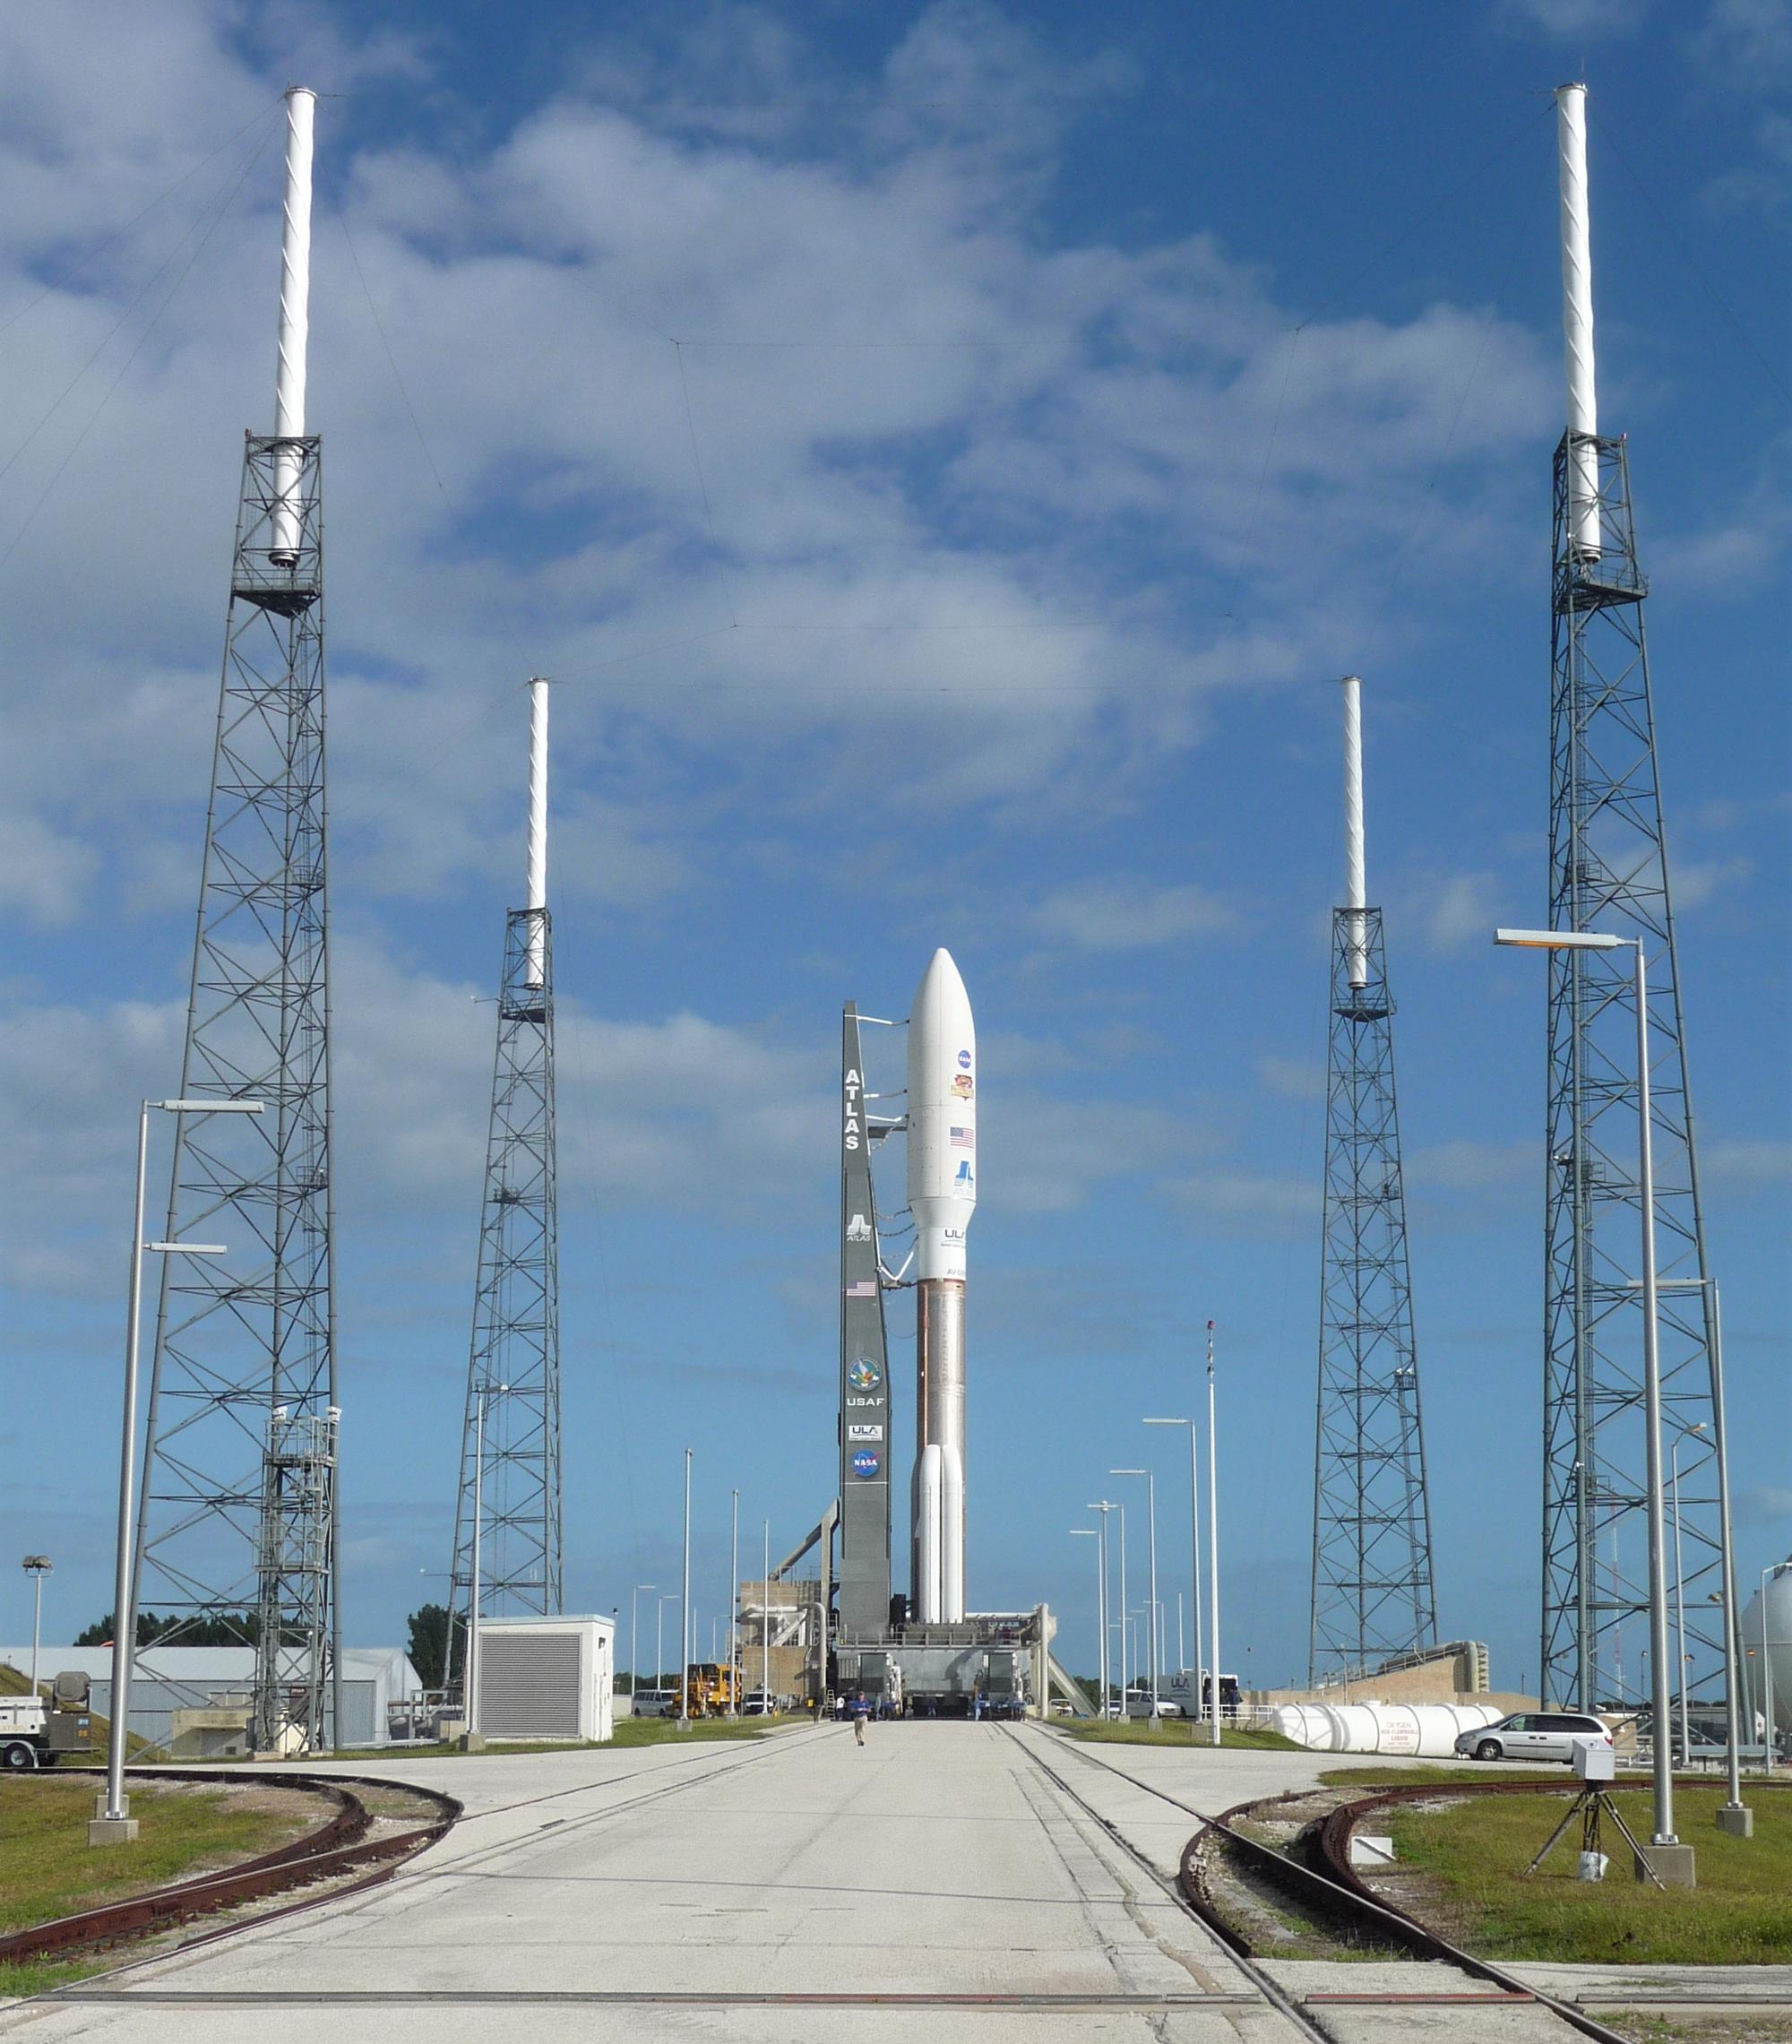 NASA Fuels Rocket to Launch Huge New Mars Rover